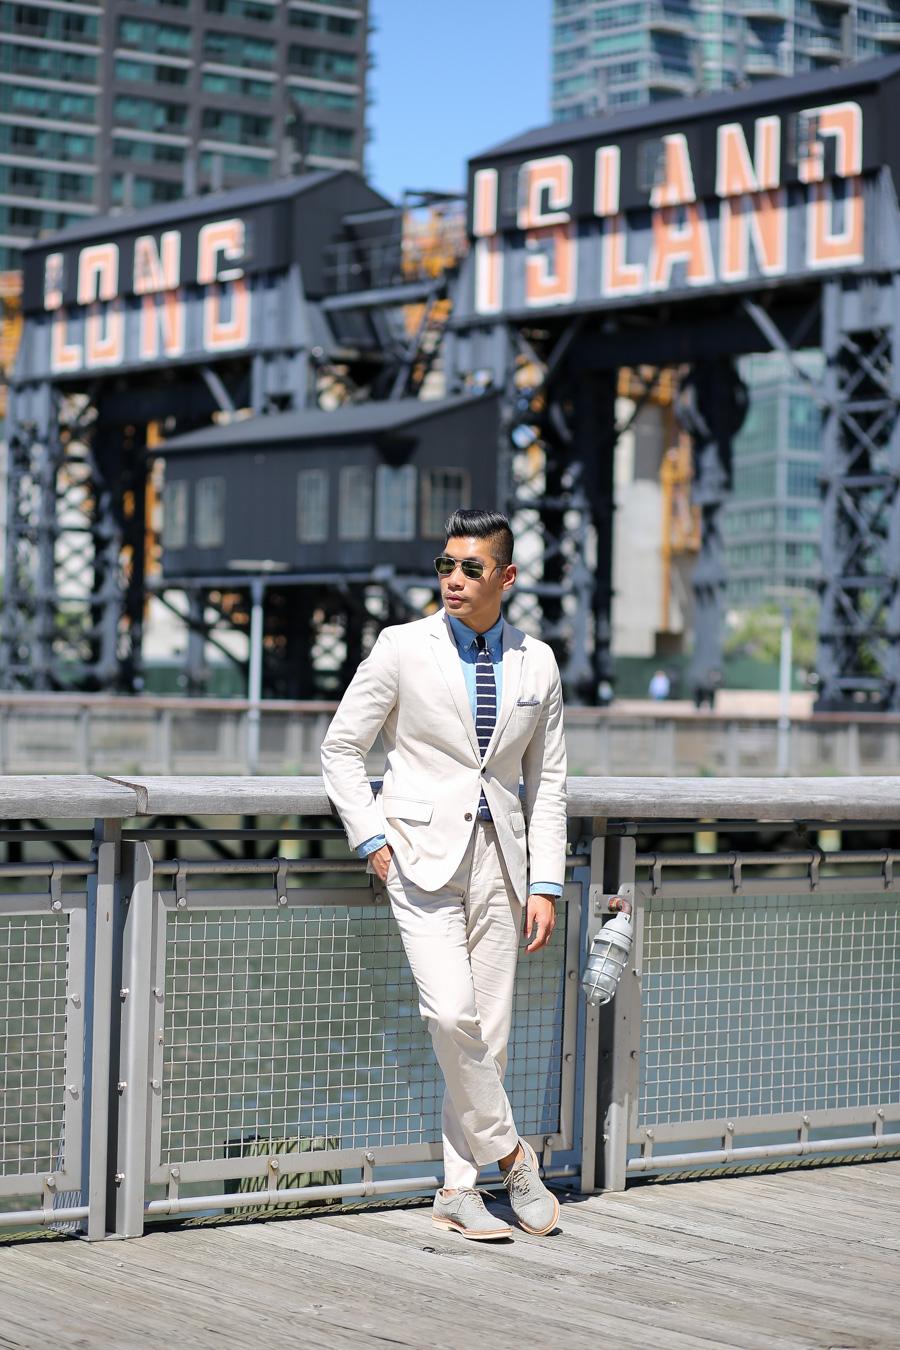 Levitate Style, Leo Chan, menswear, Suede Wingtip, Allen Edmonds